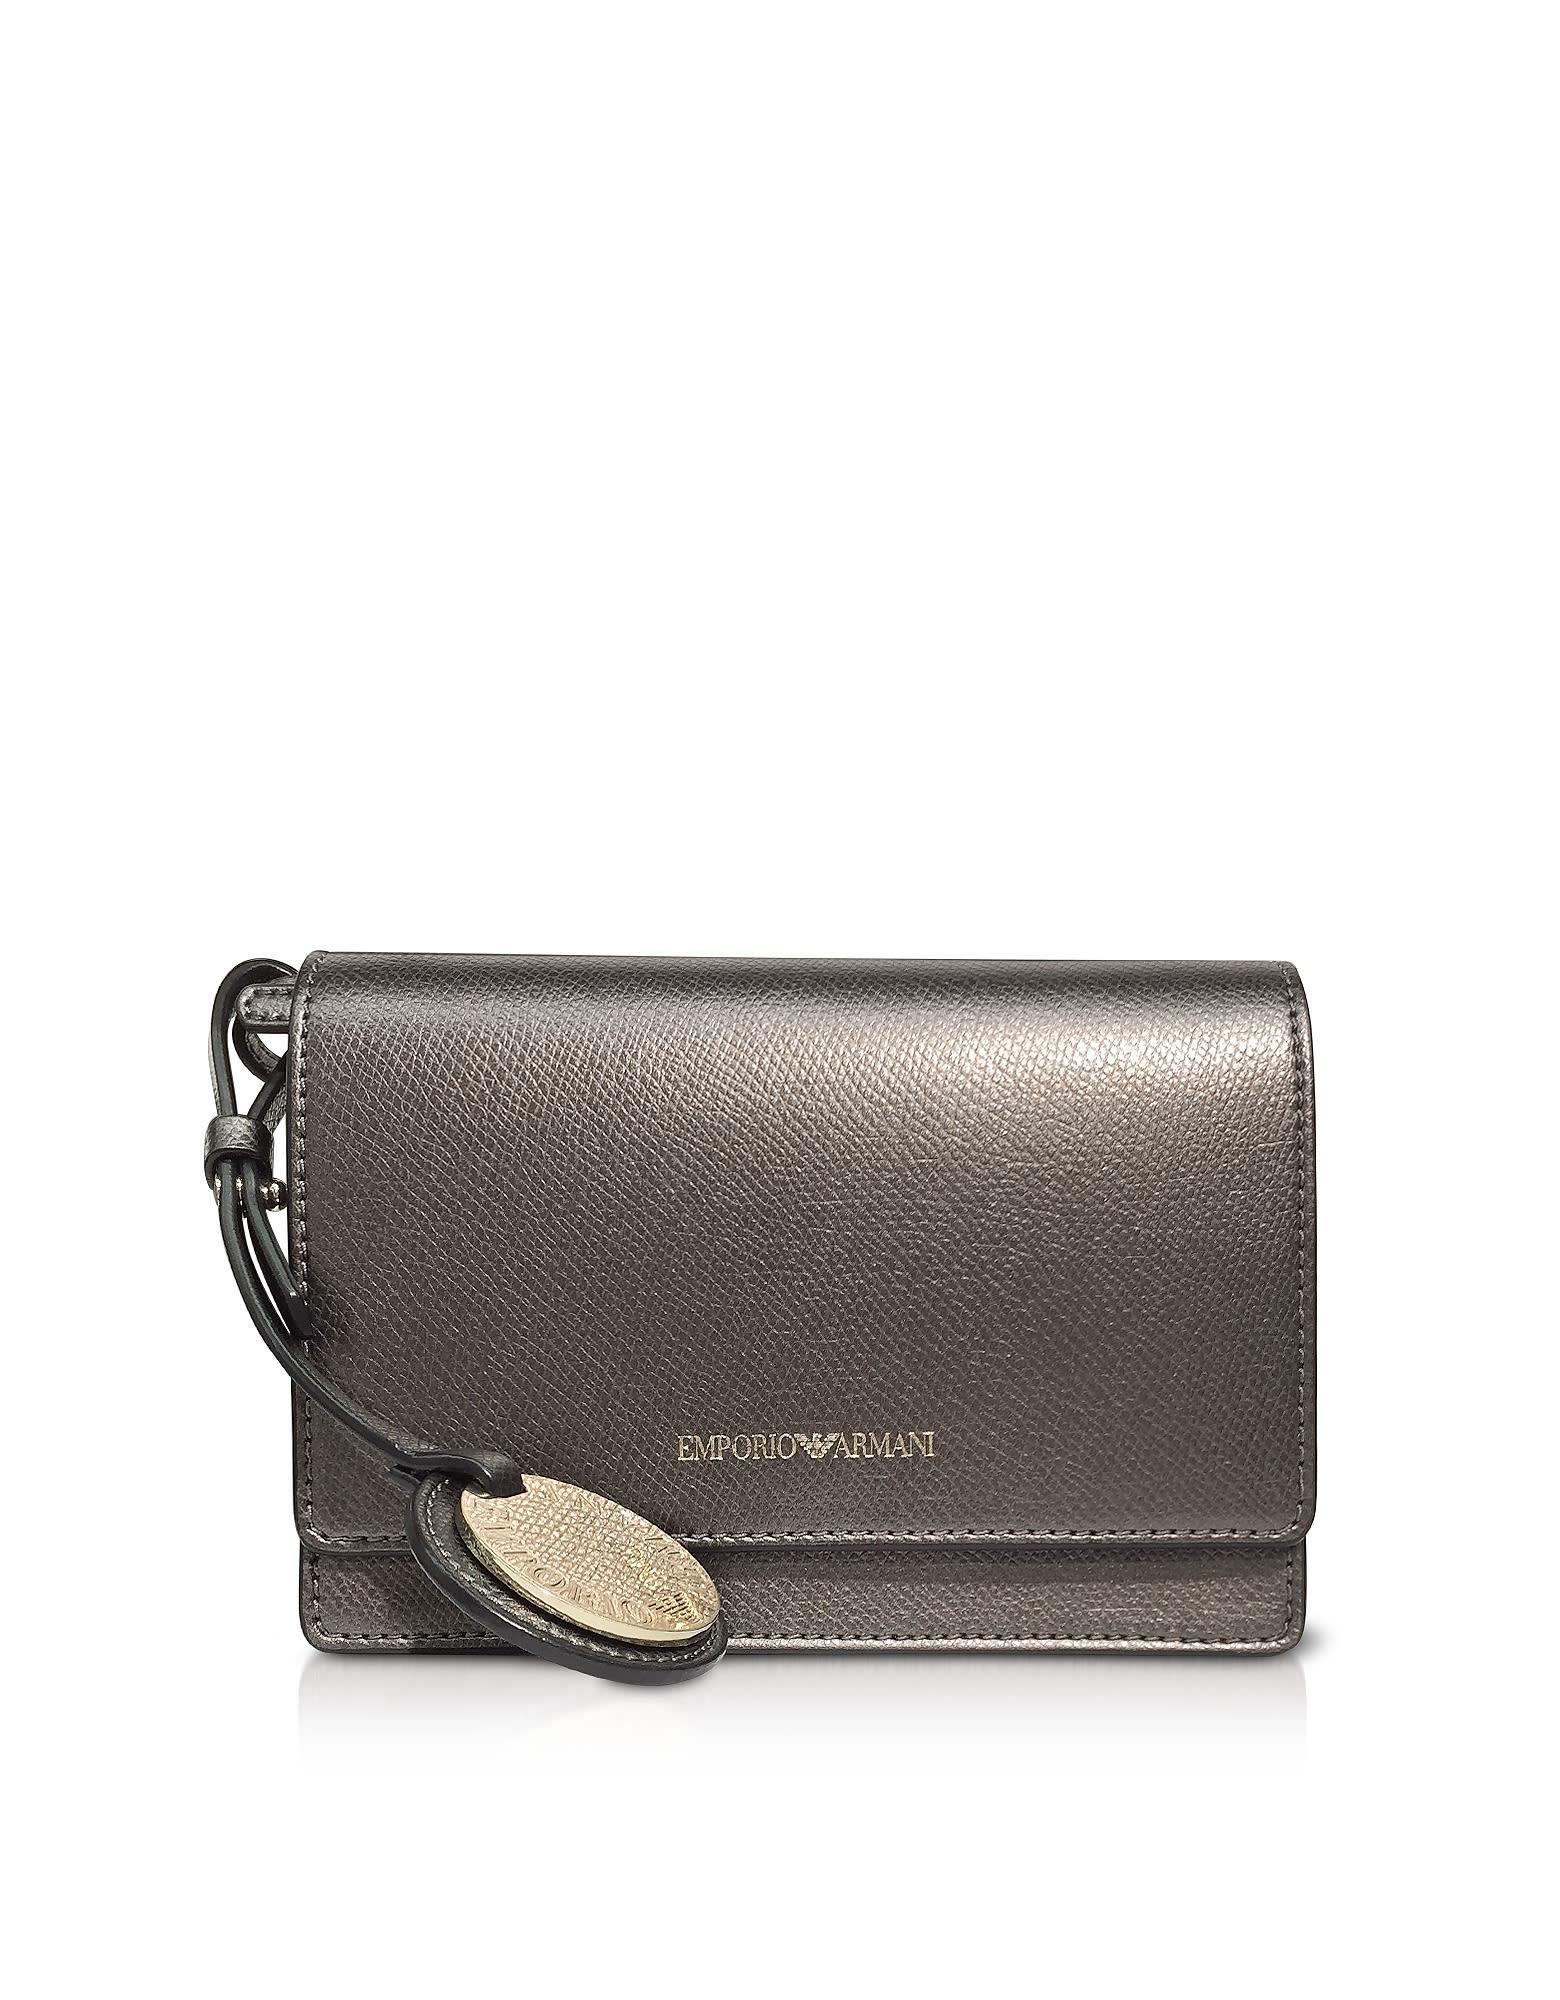 158d0d8c5c Lizard Embossed Leather Mini Shoulder Bag in Bronze